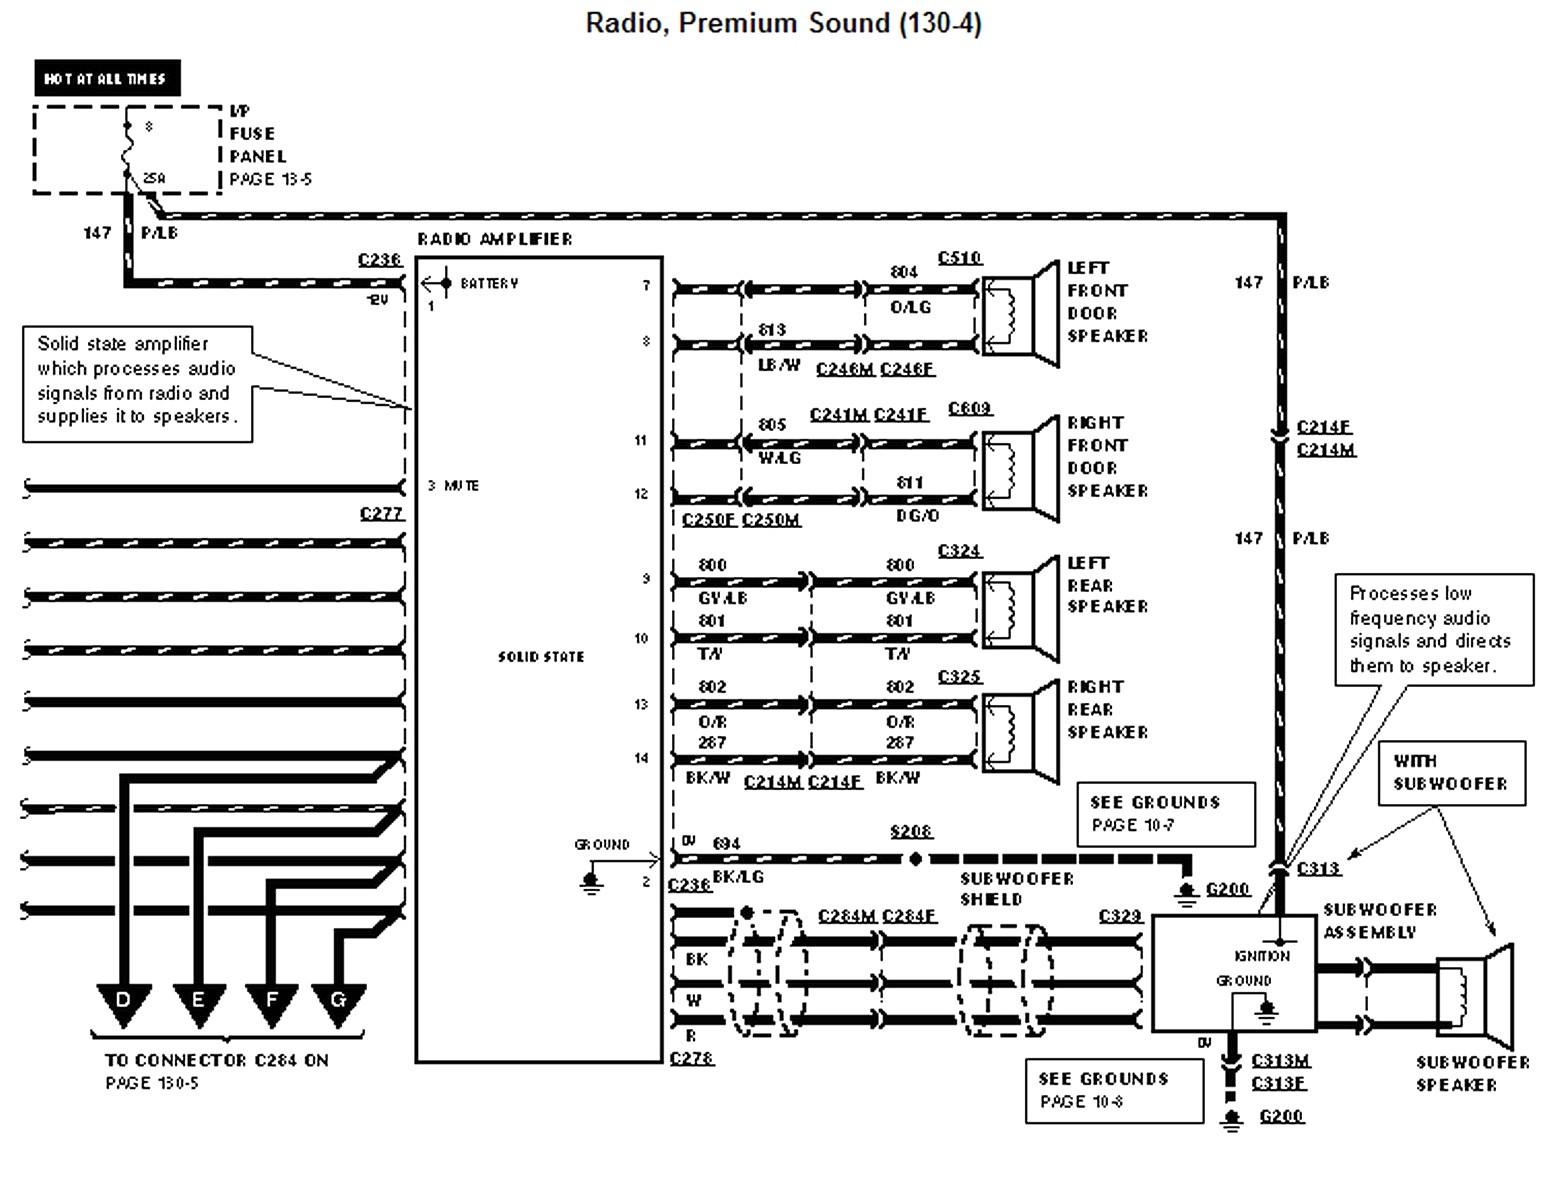 96 F250 Wiring Diagram Wiring Diagram 96 F250 Stereo Wiring Diagram 1996 F250 Radio Wiring Diagram